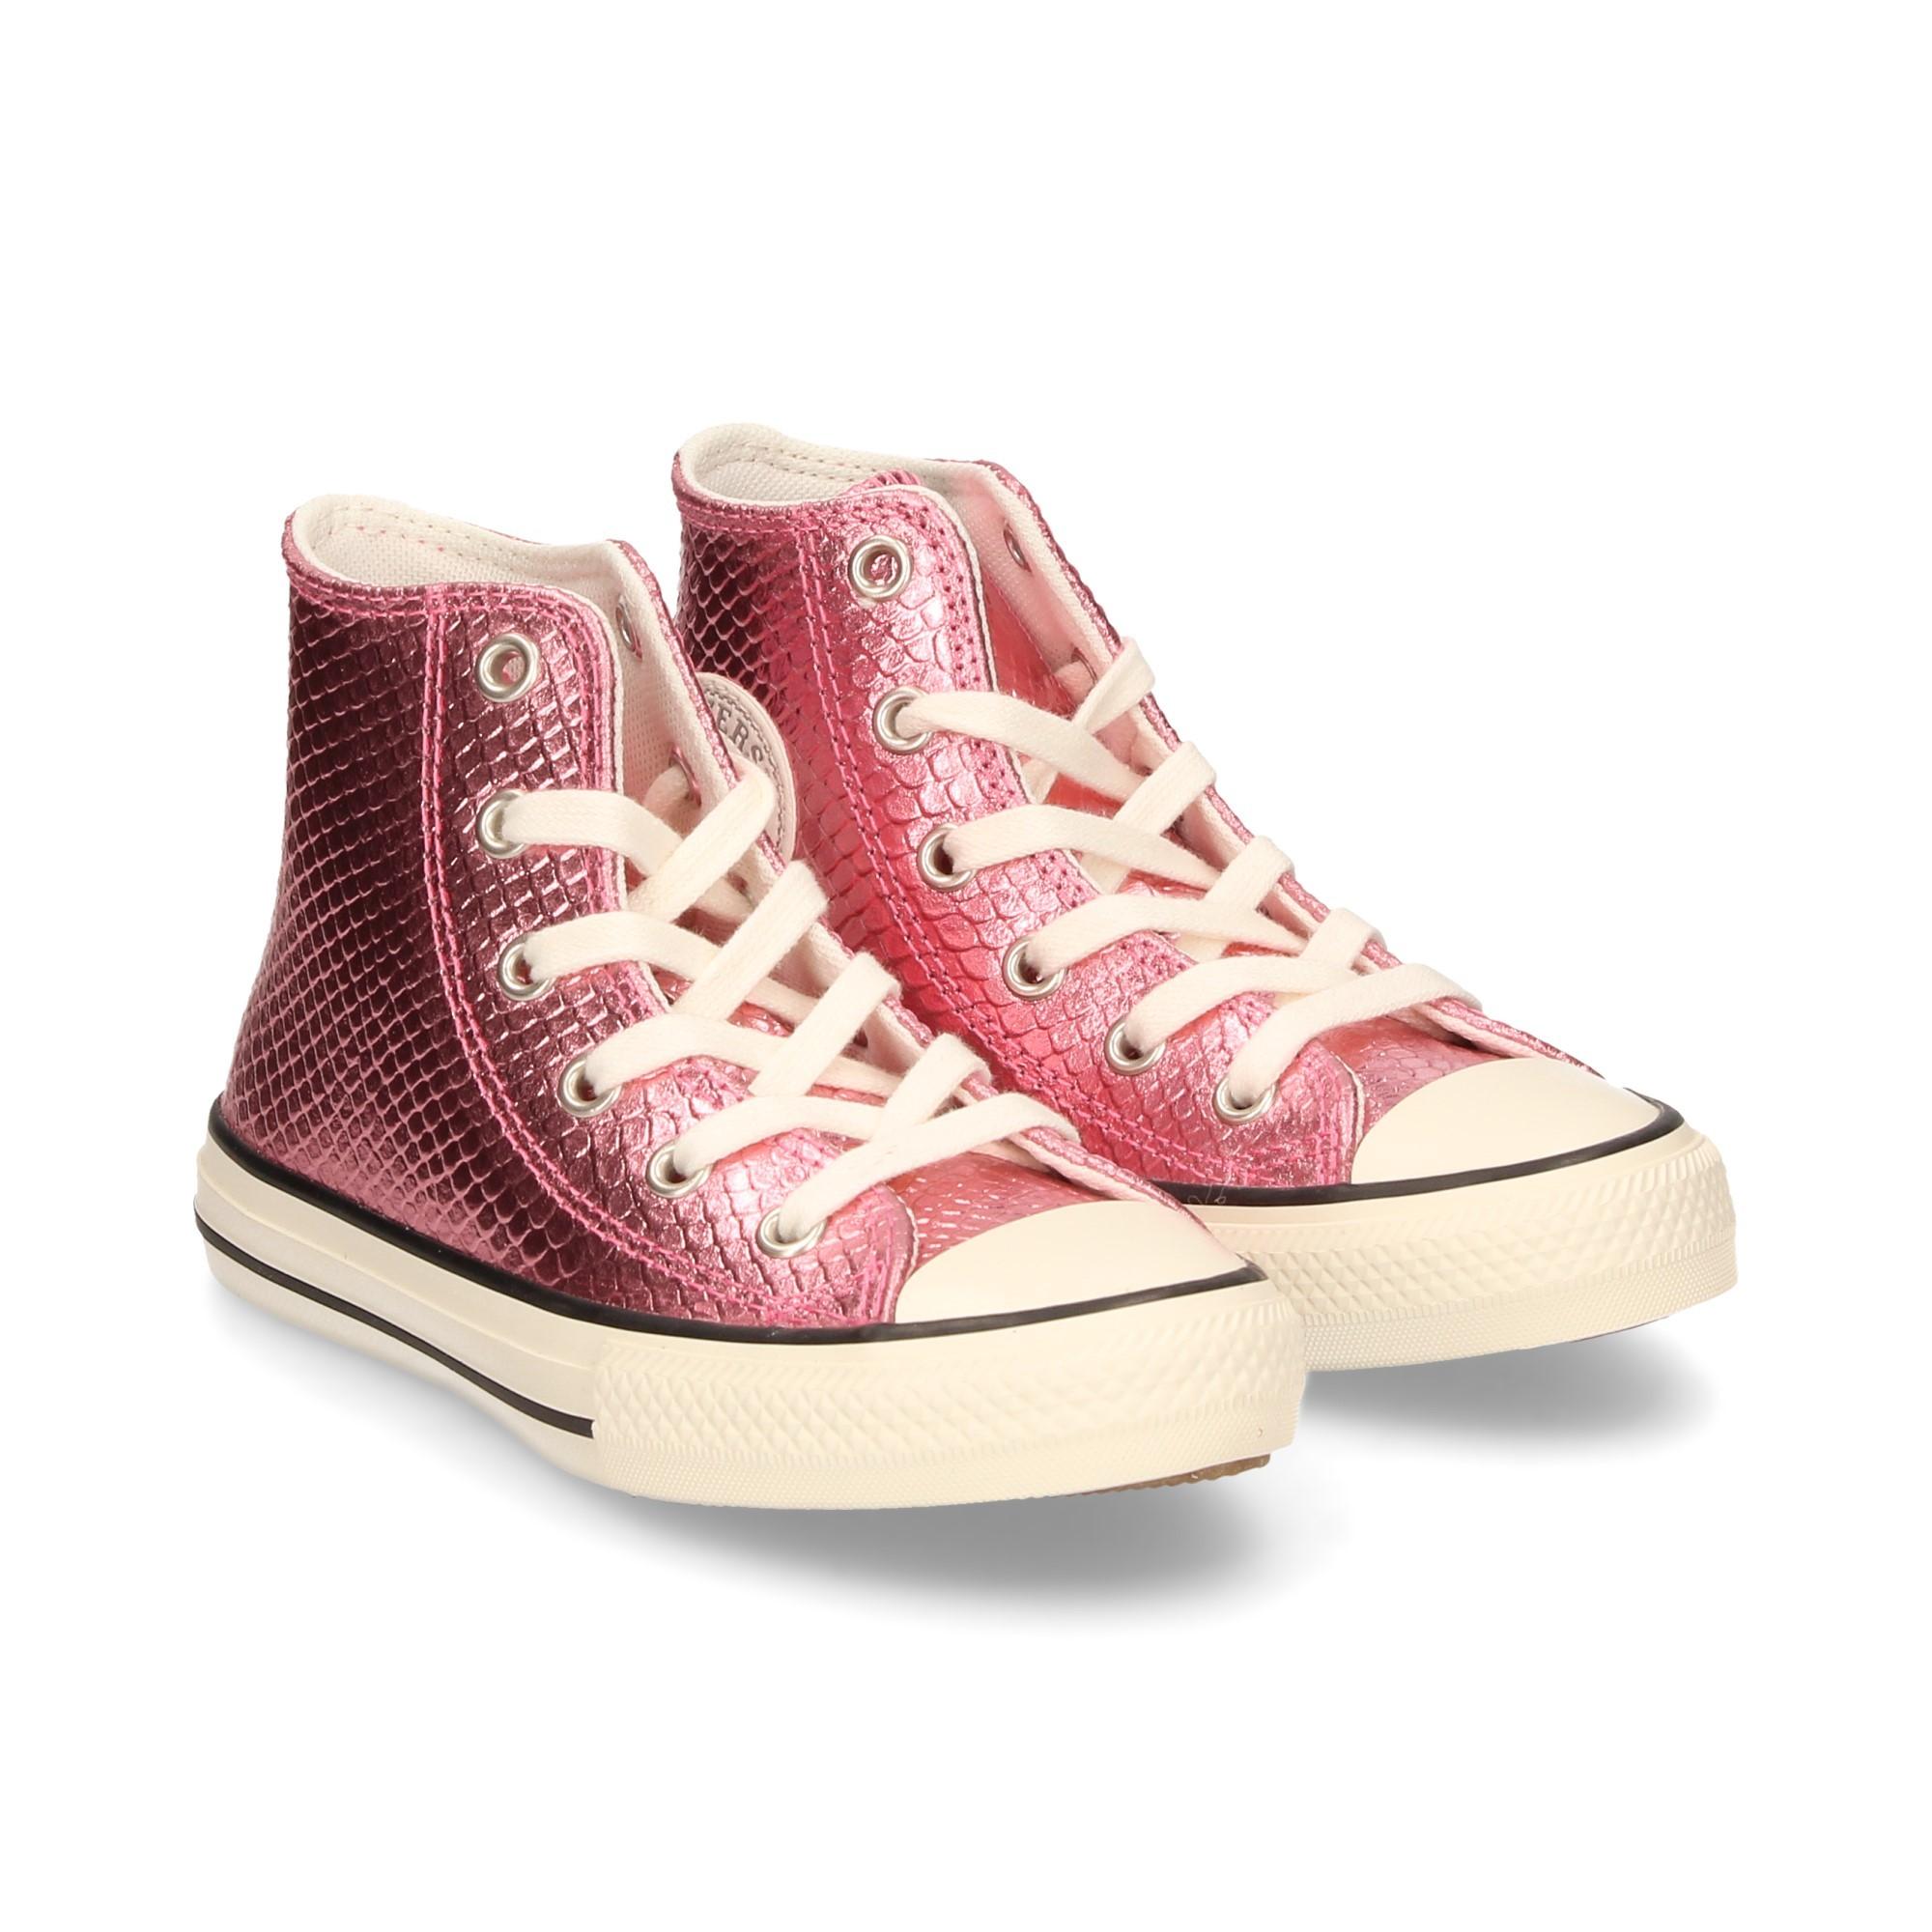 CONVERSE Girls sneakers 665835C PLUM CHALKEGRE